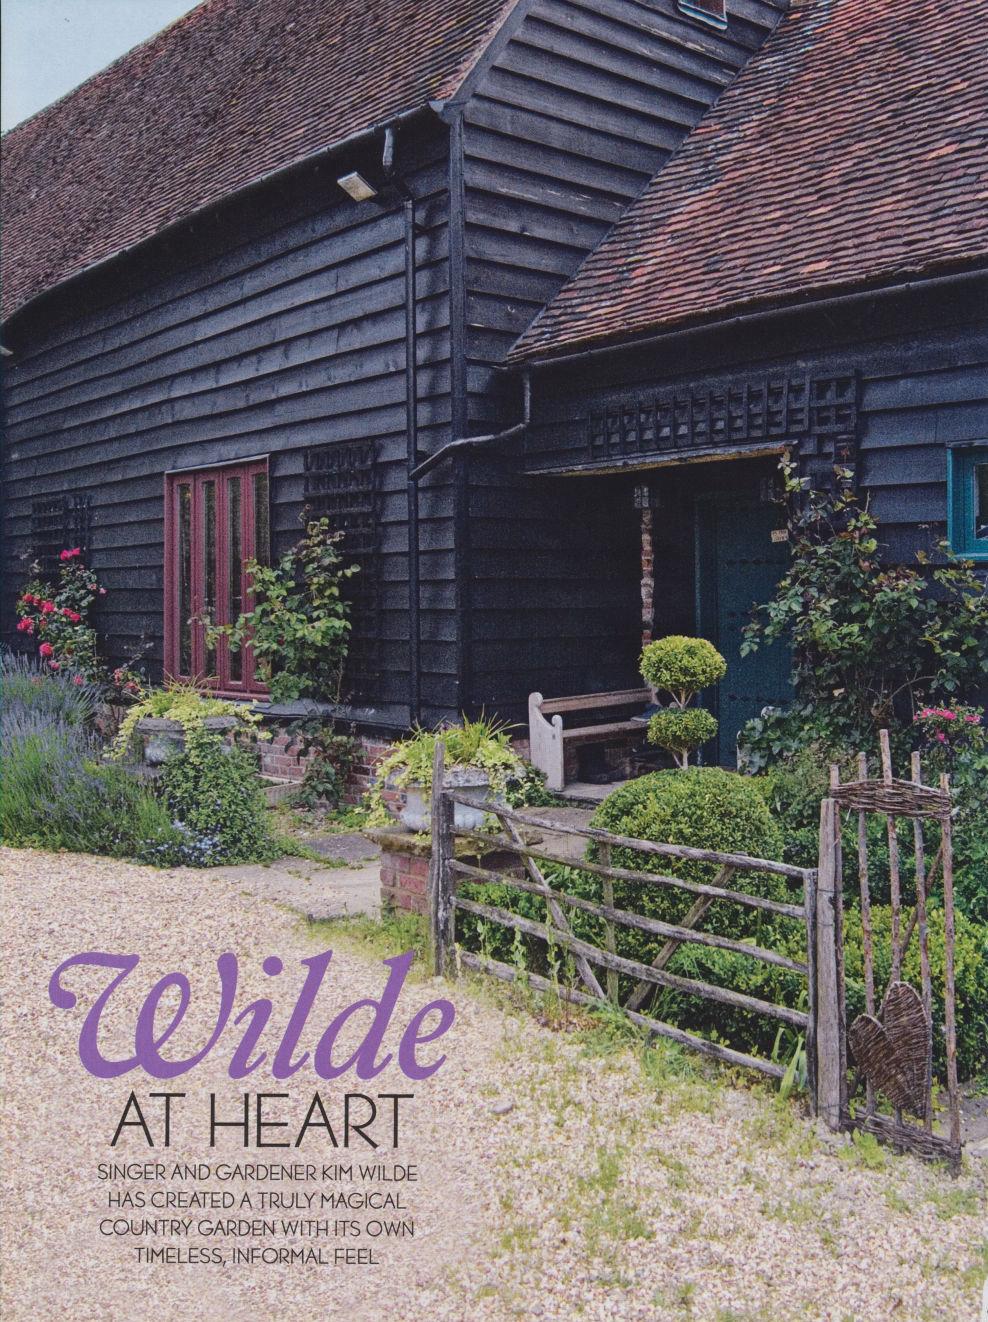 wilde at heart wilde life